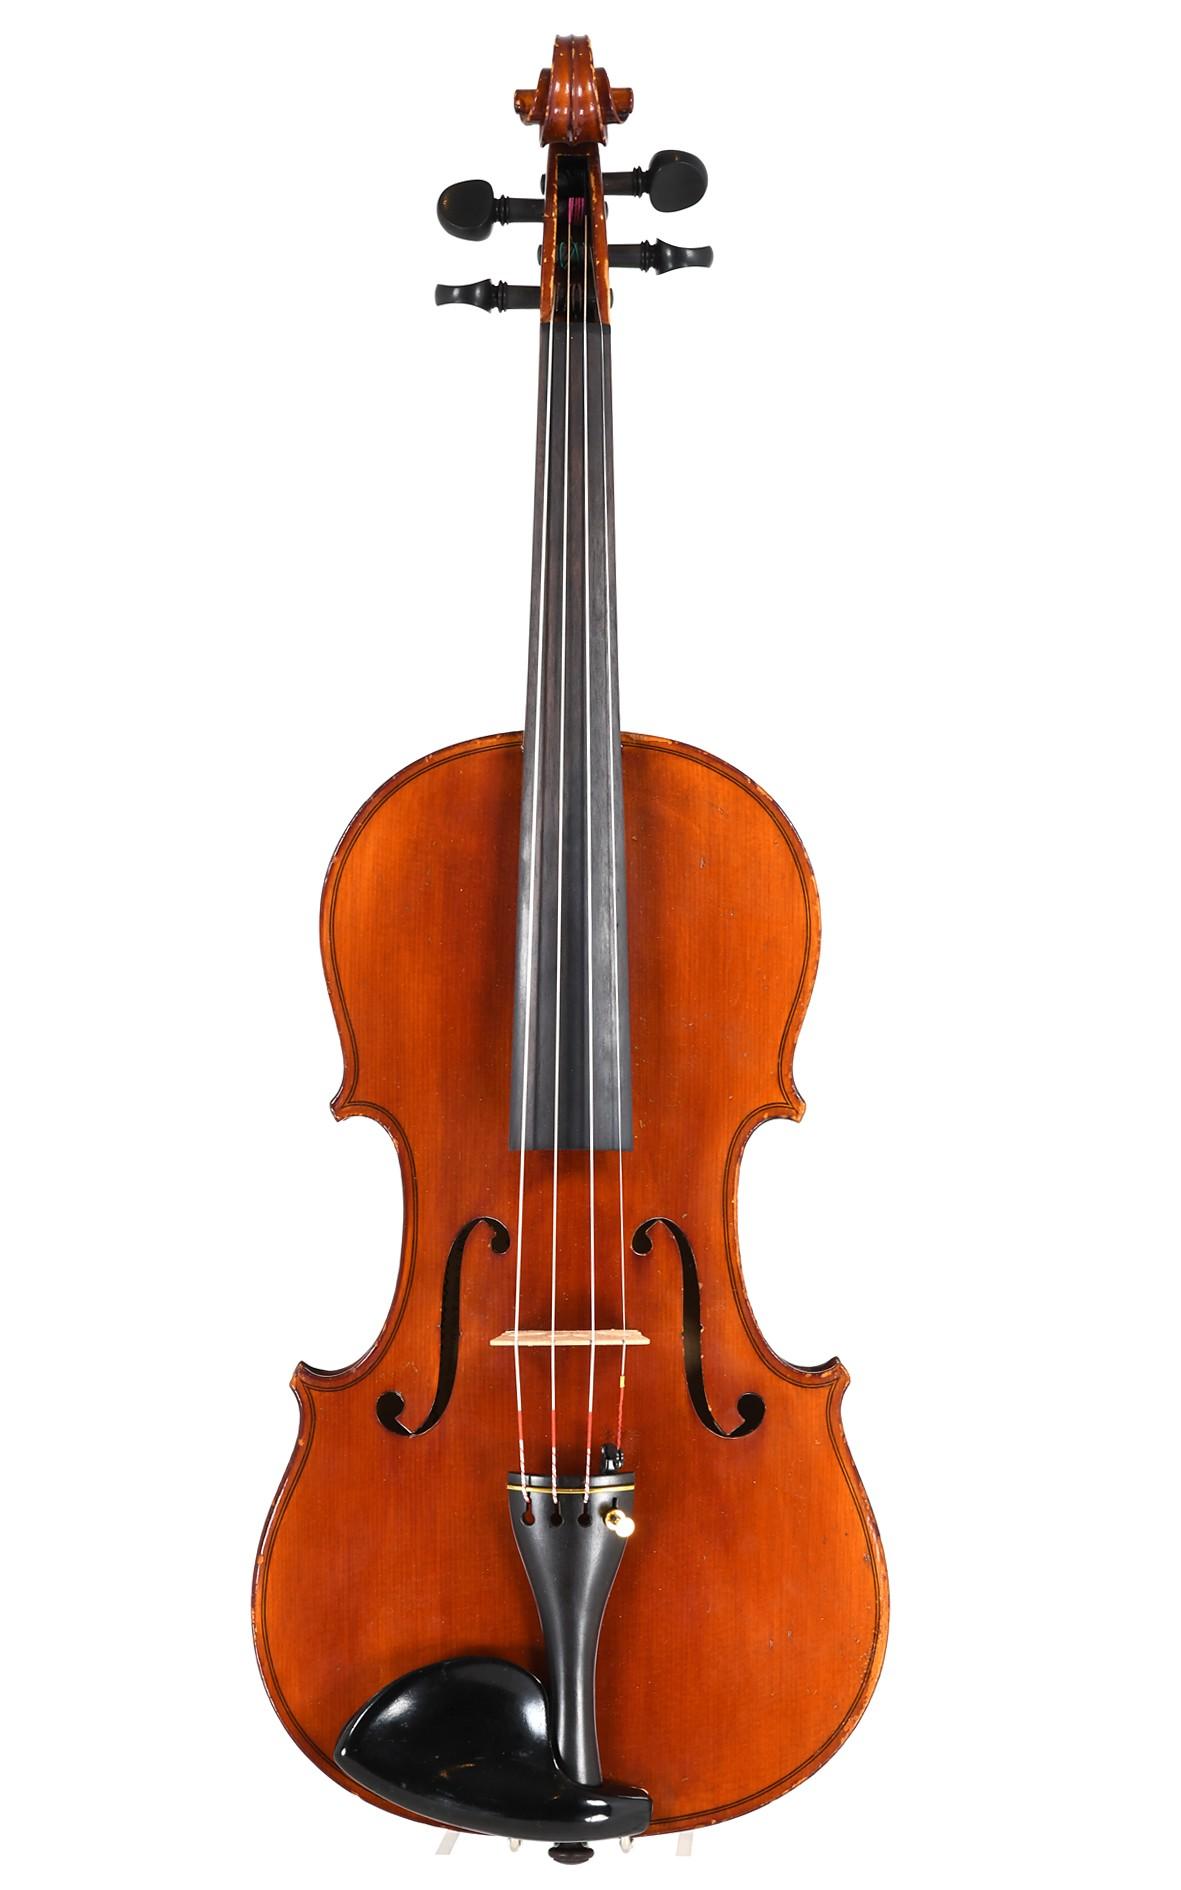 J. A. Baader violin